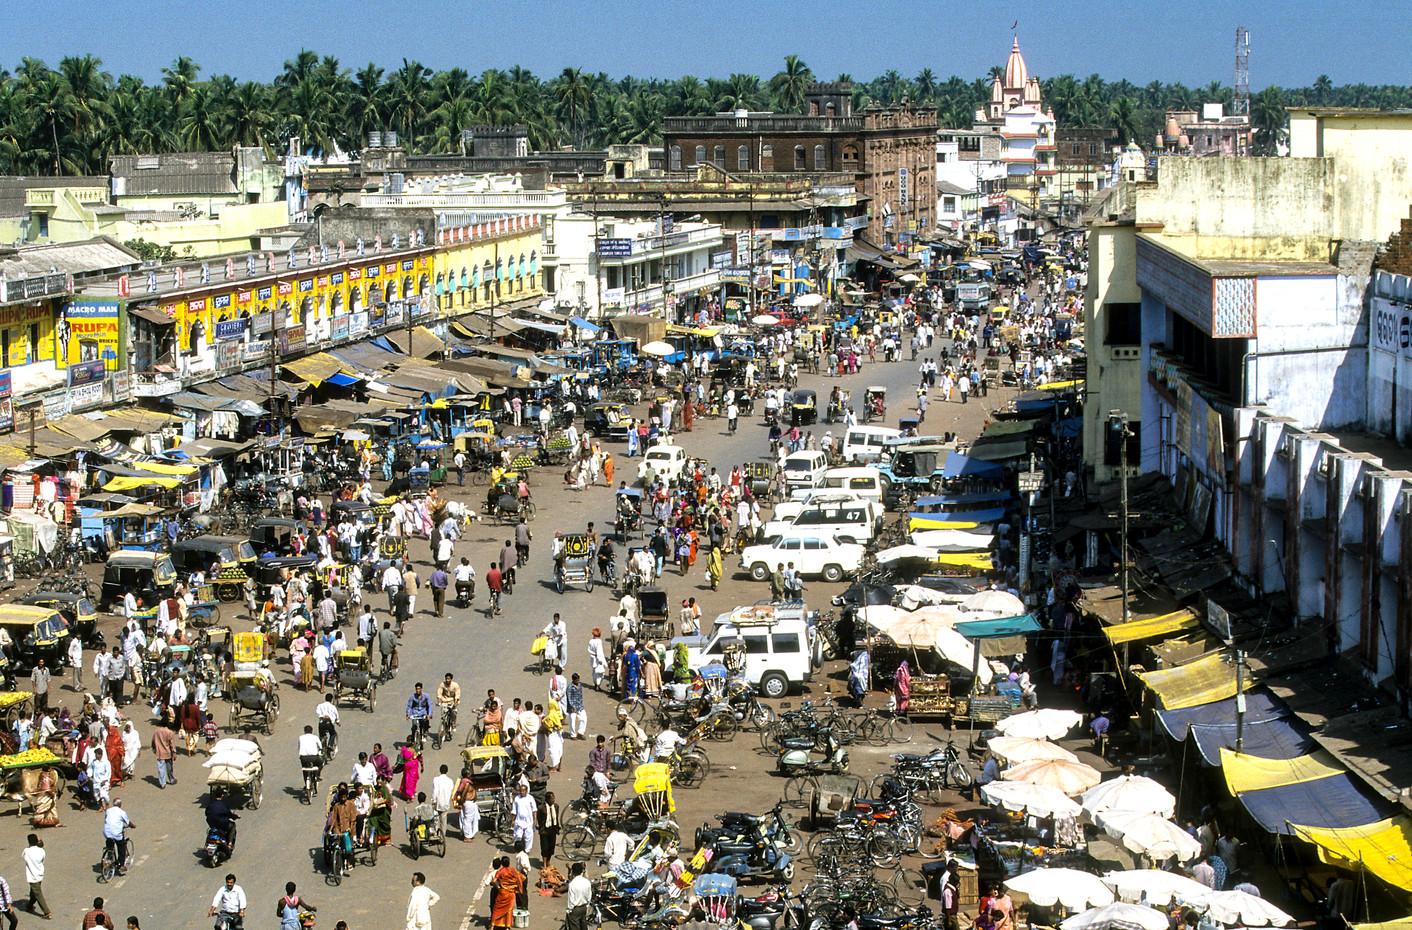 Street scene, India